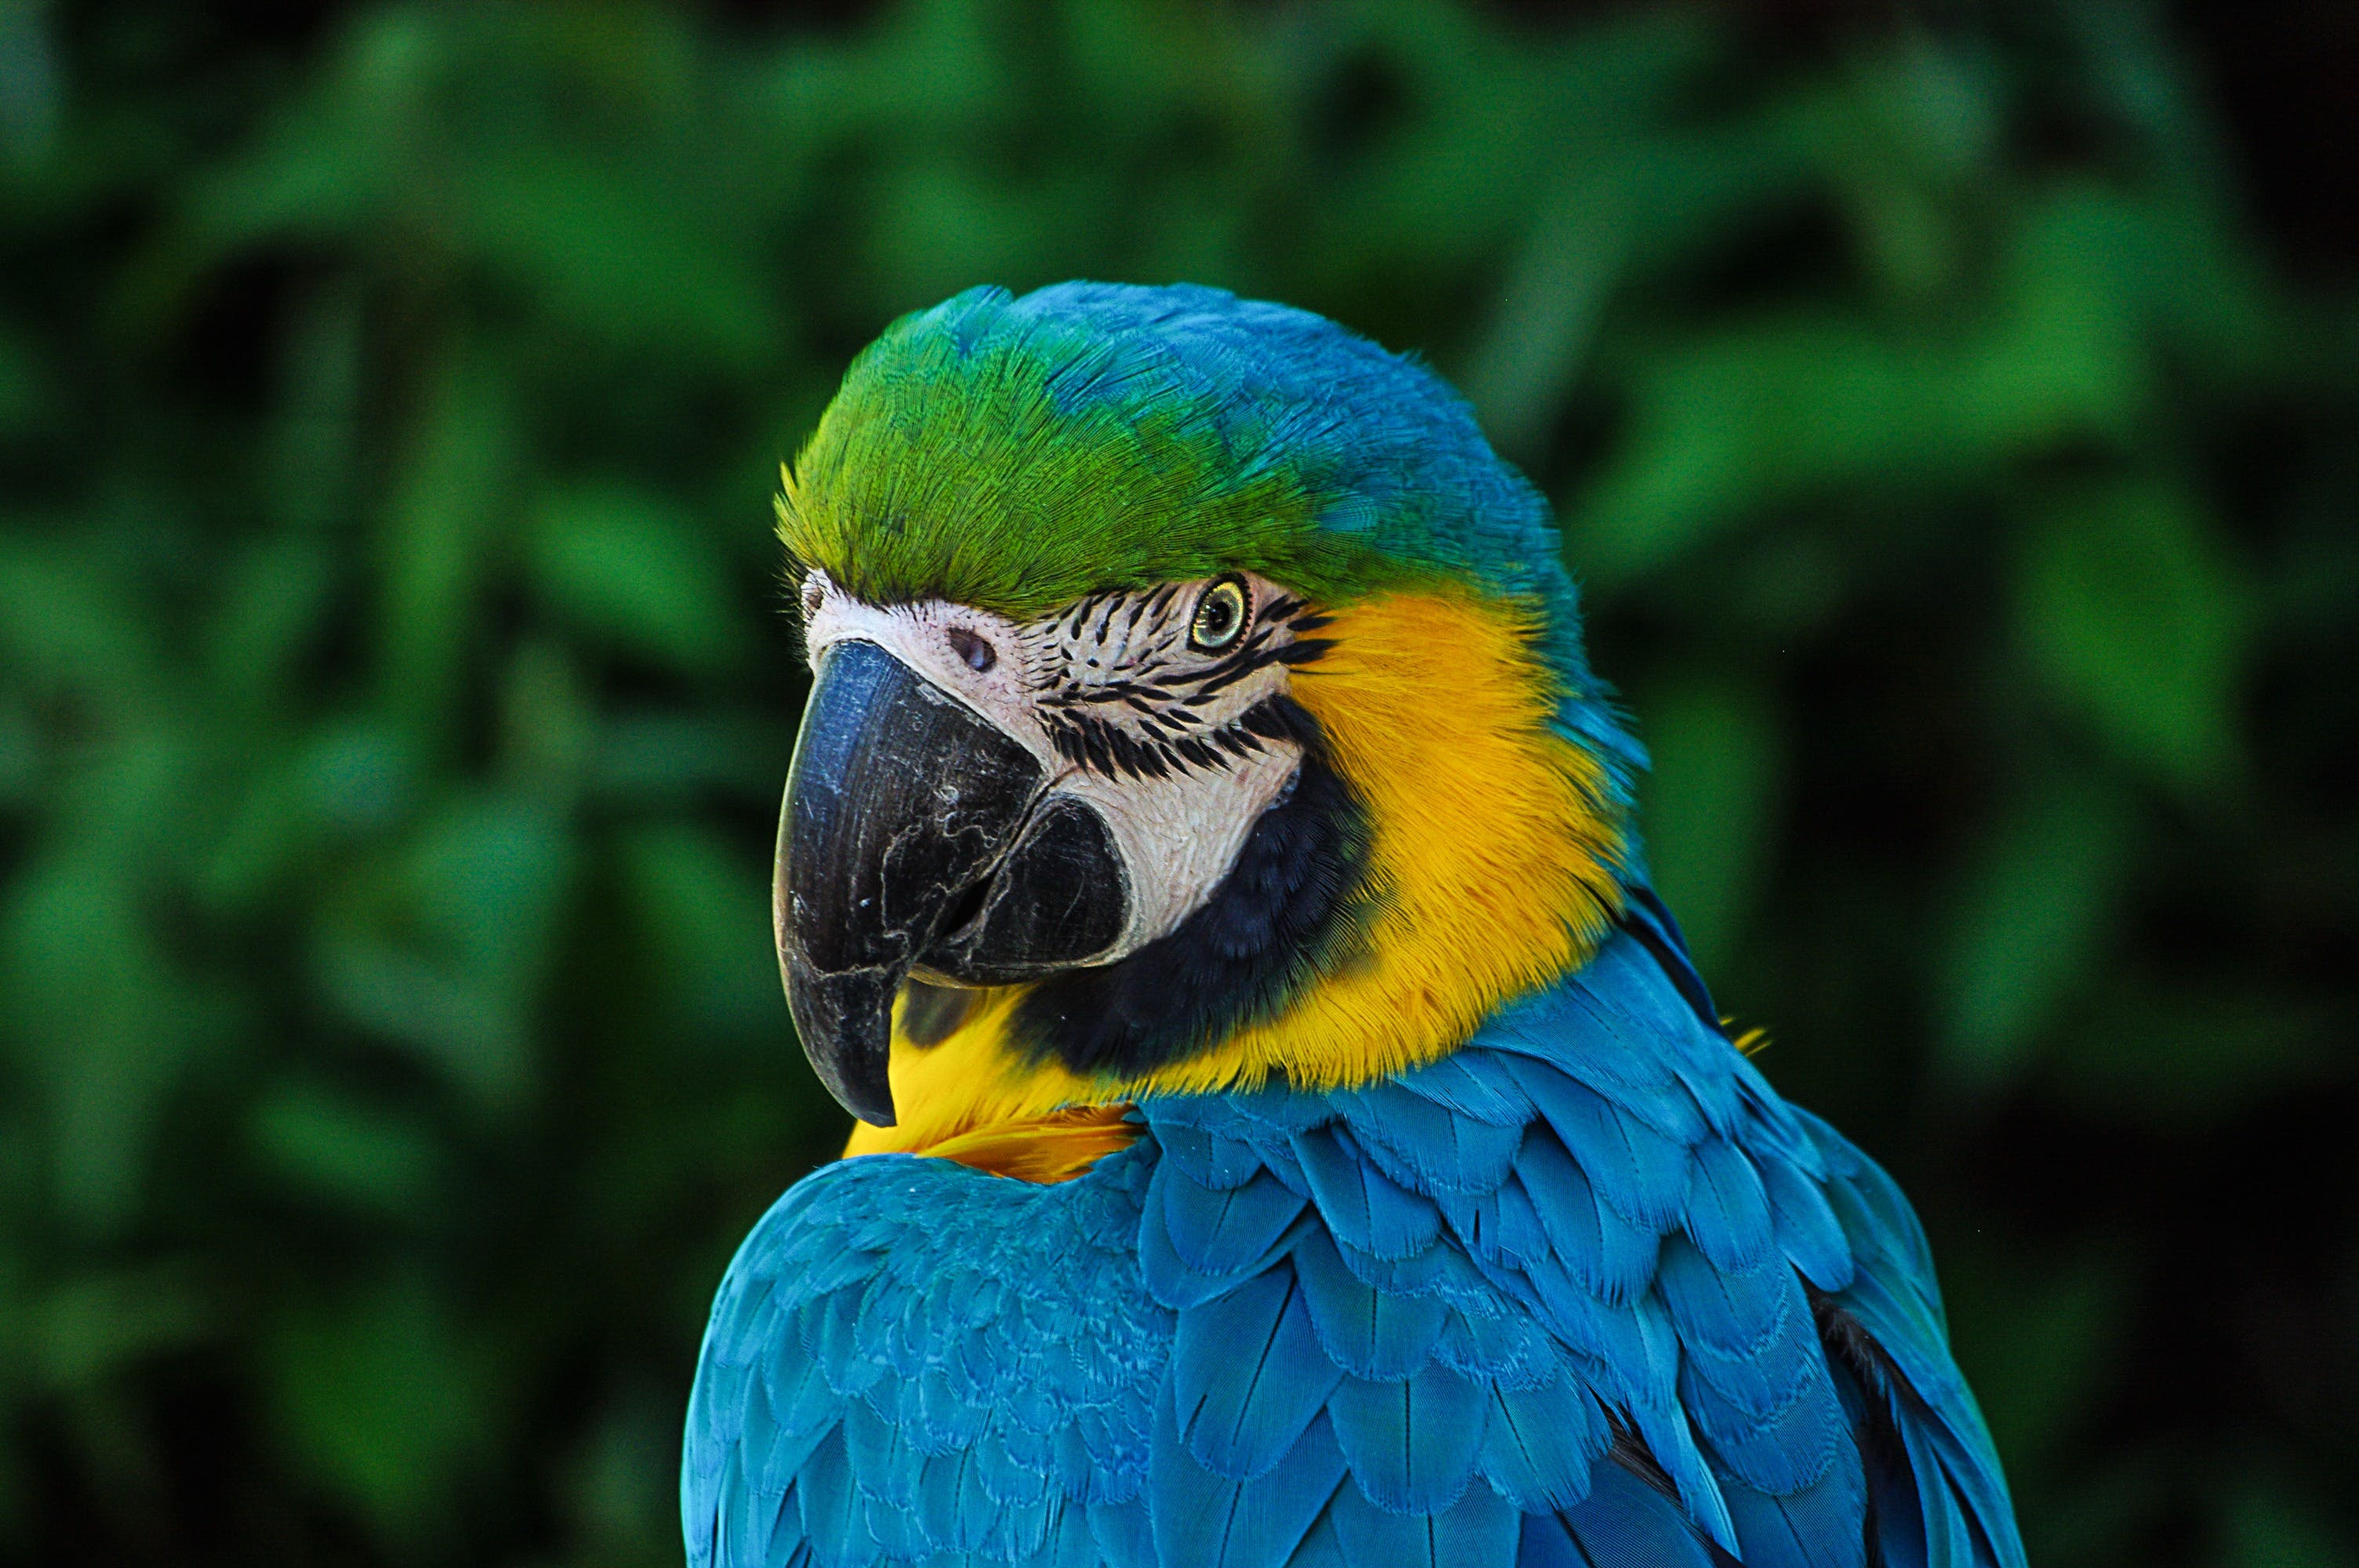 Kostenloses Stock Foto zu natur, vogel, tier, makro